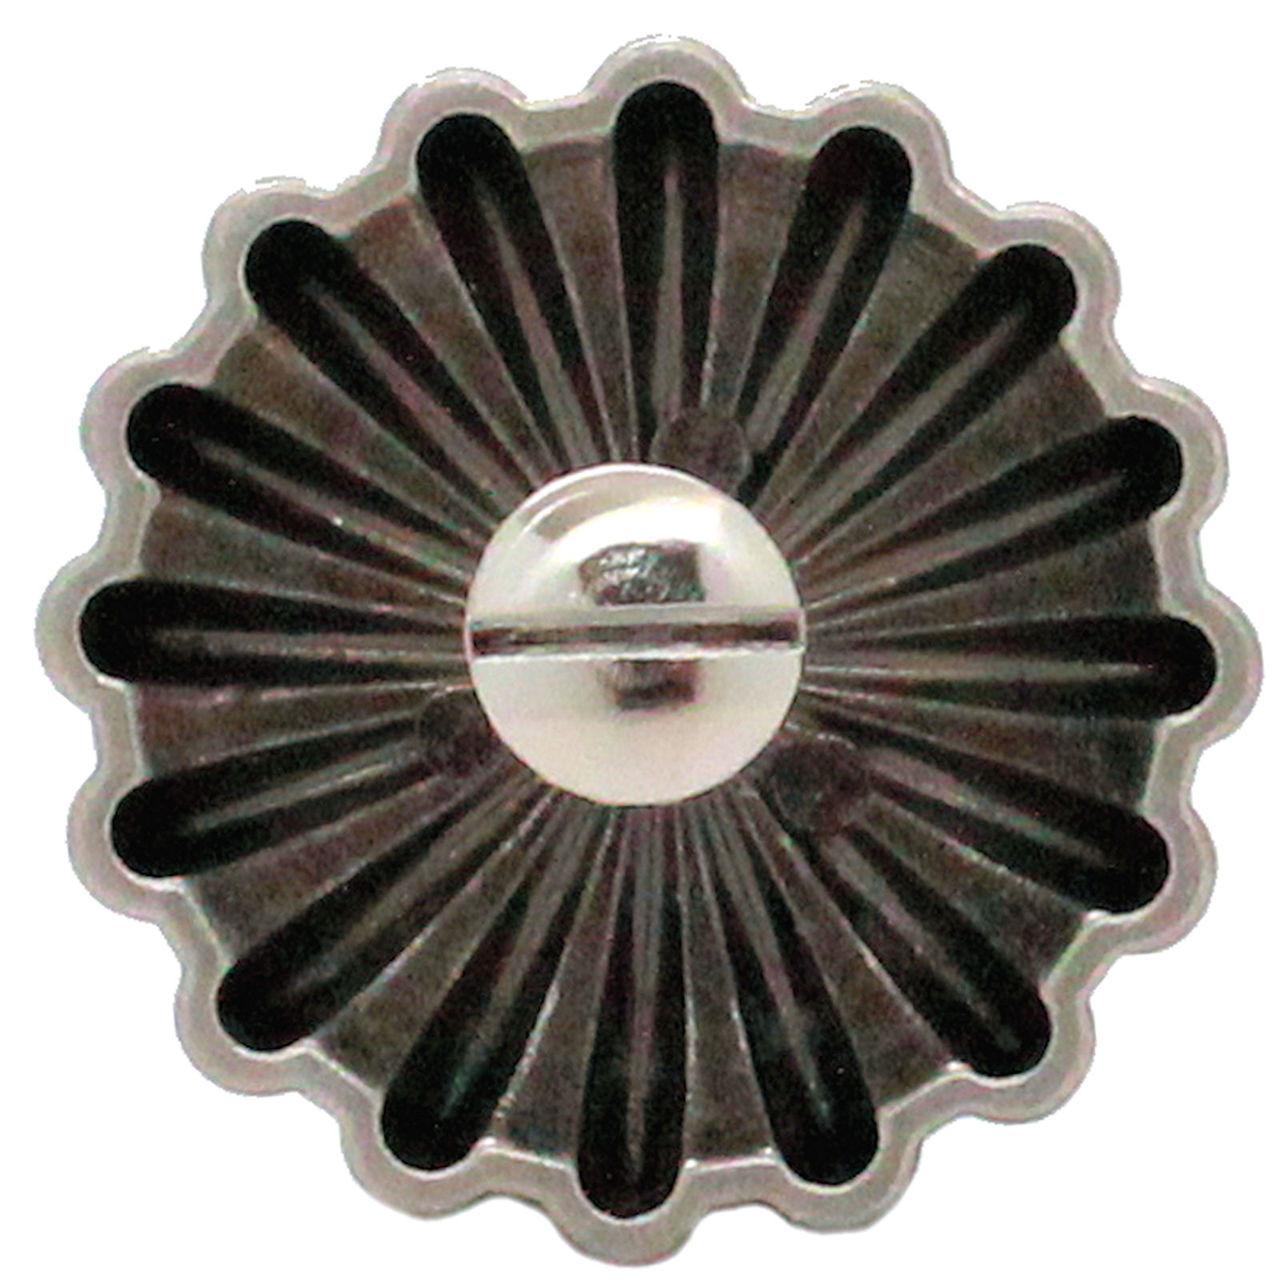 "Parachute Concho Antique Nickel 1.5"" Back"